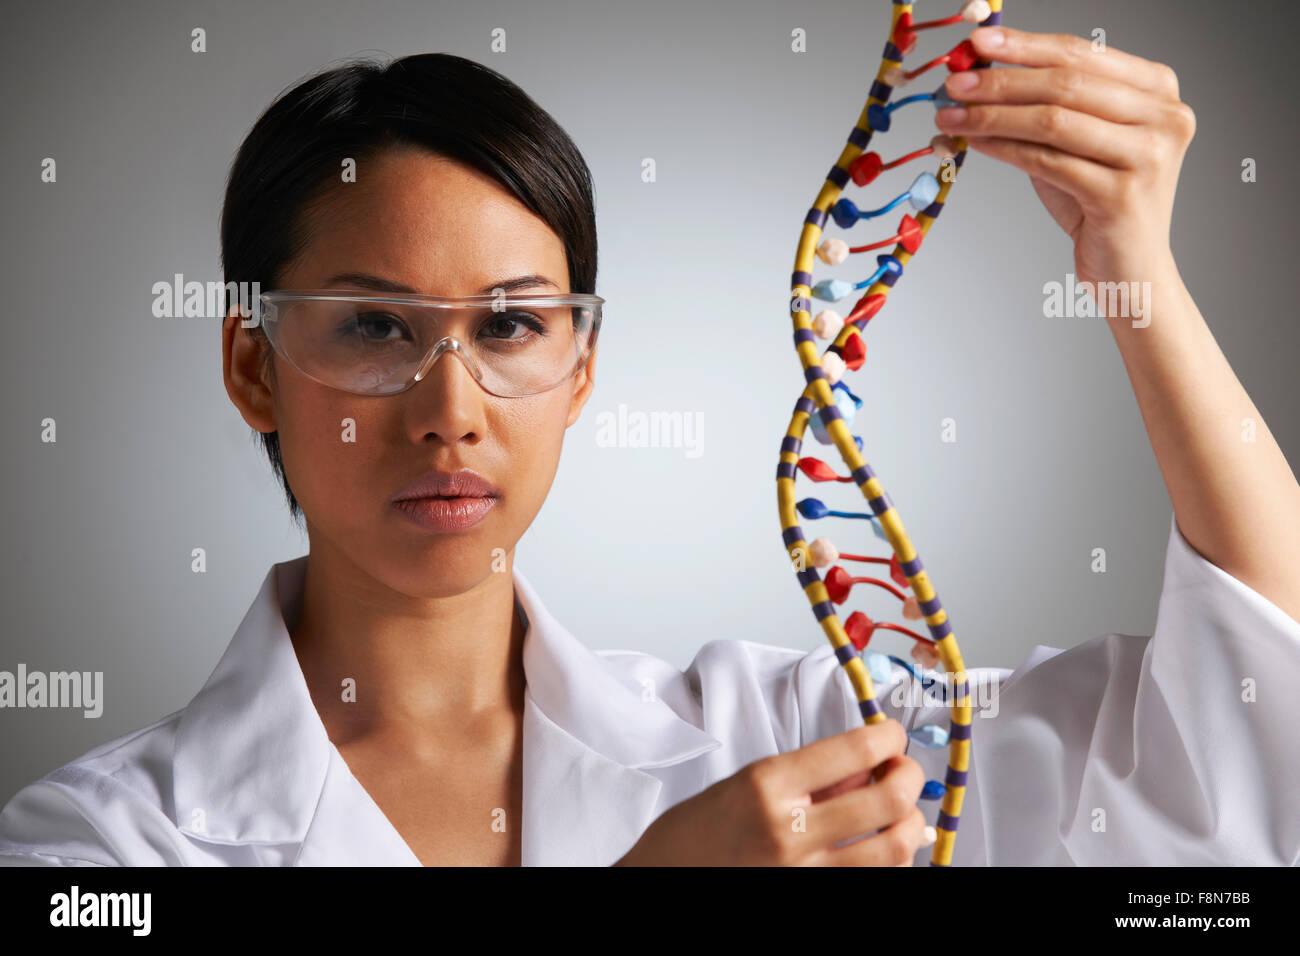 Wissenschaftlerin Studium molekulare Modell In Form der Helix Stockbild